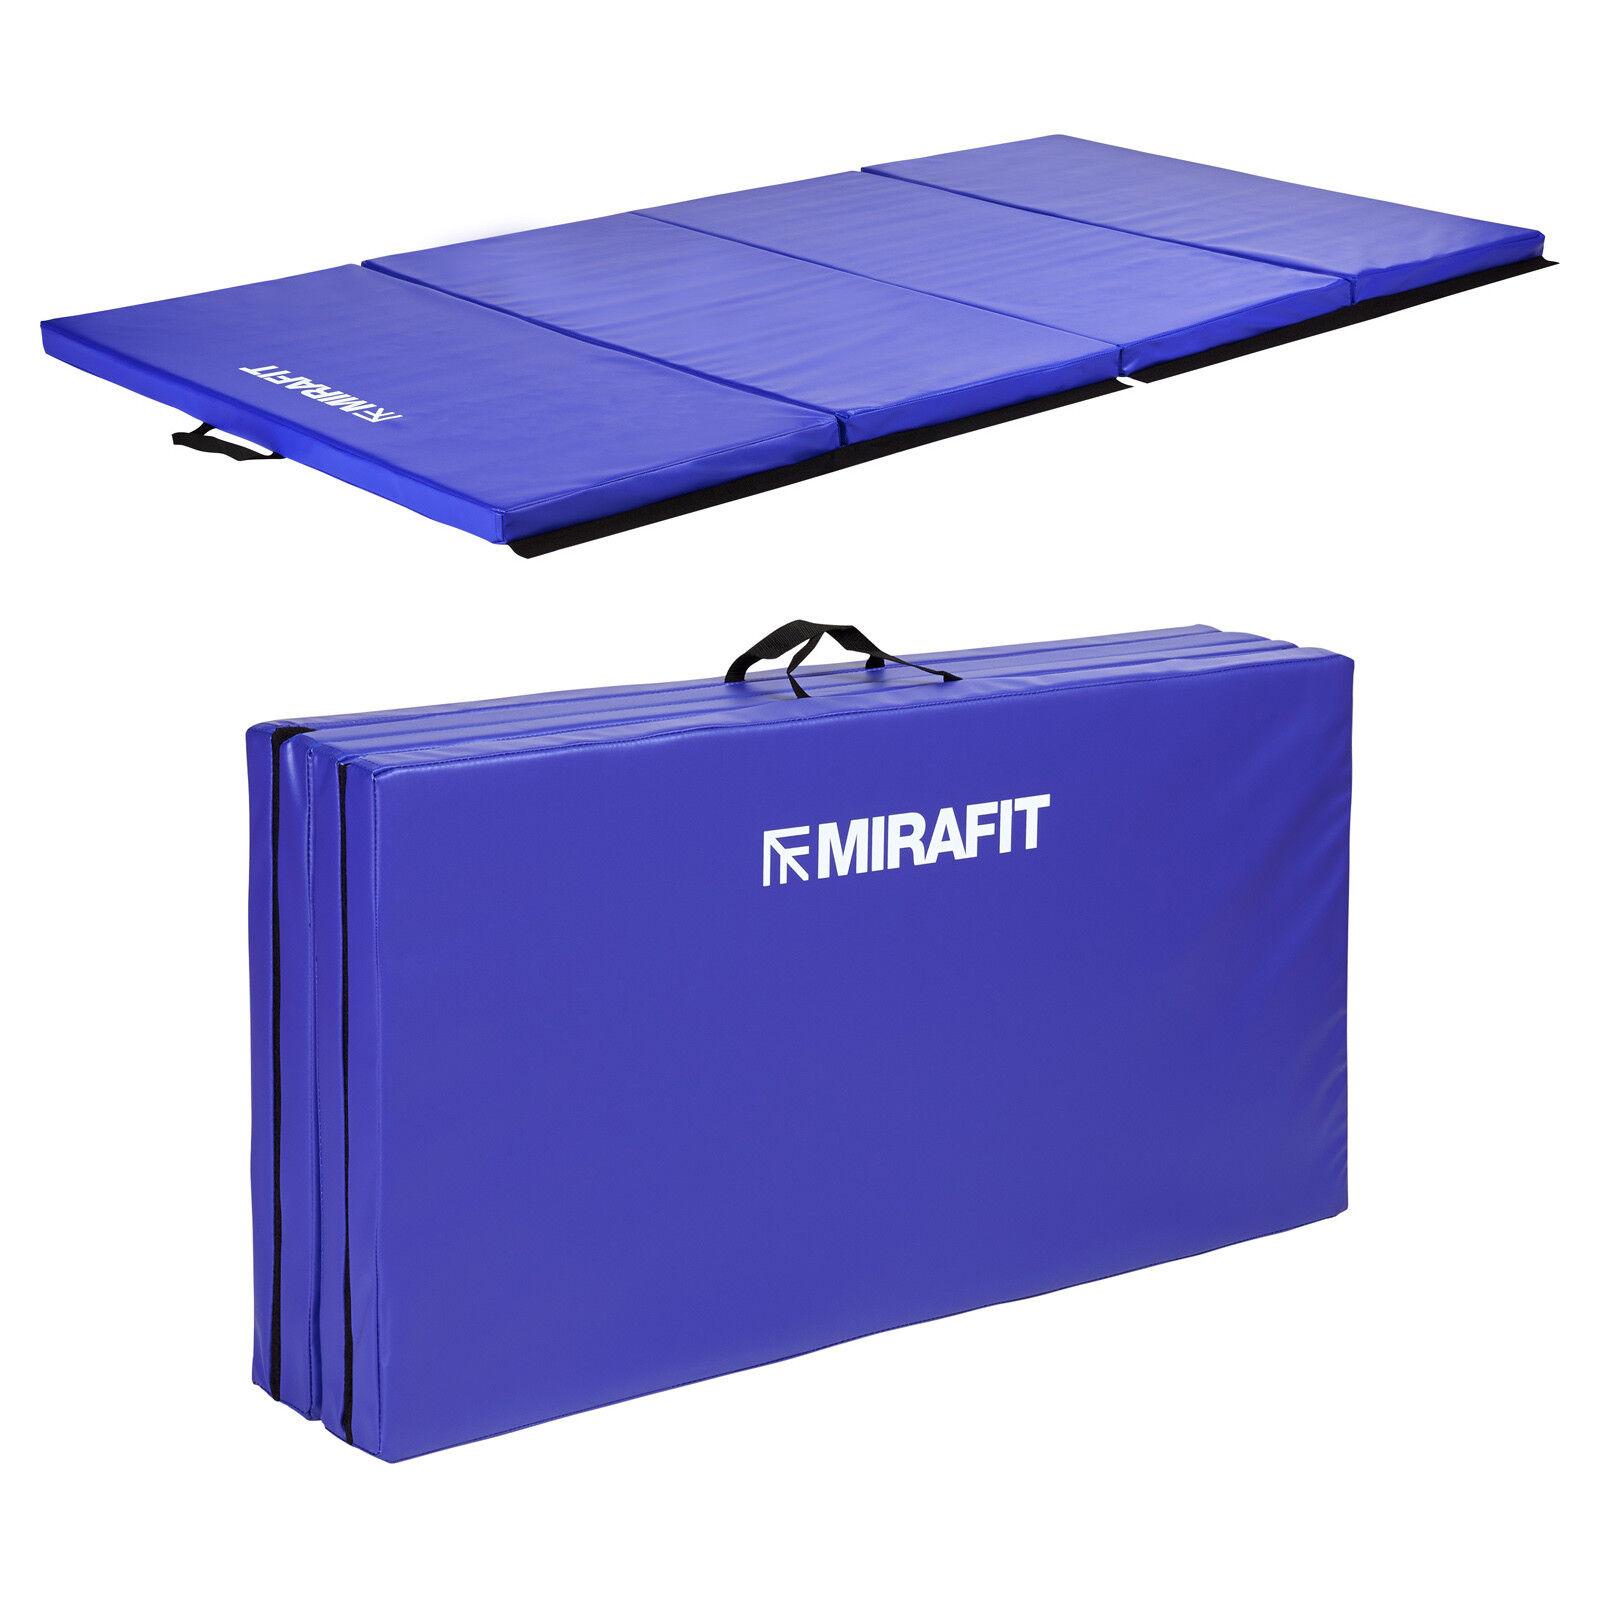 Mirafit Large bluee 8ft Folding Exercise Floor Mat Workout Gymnastics Ab Gym Pt